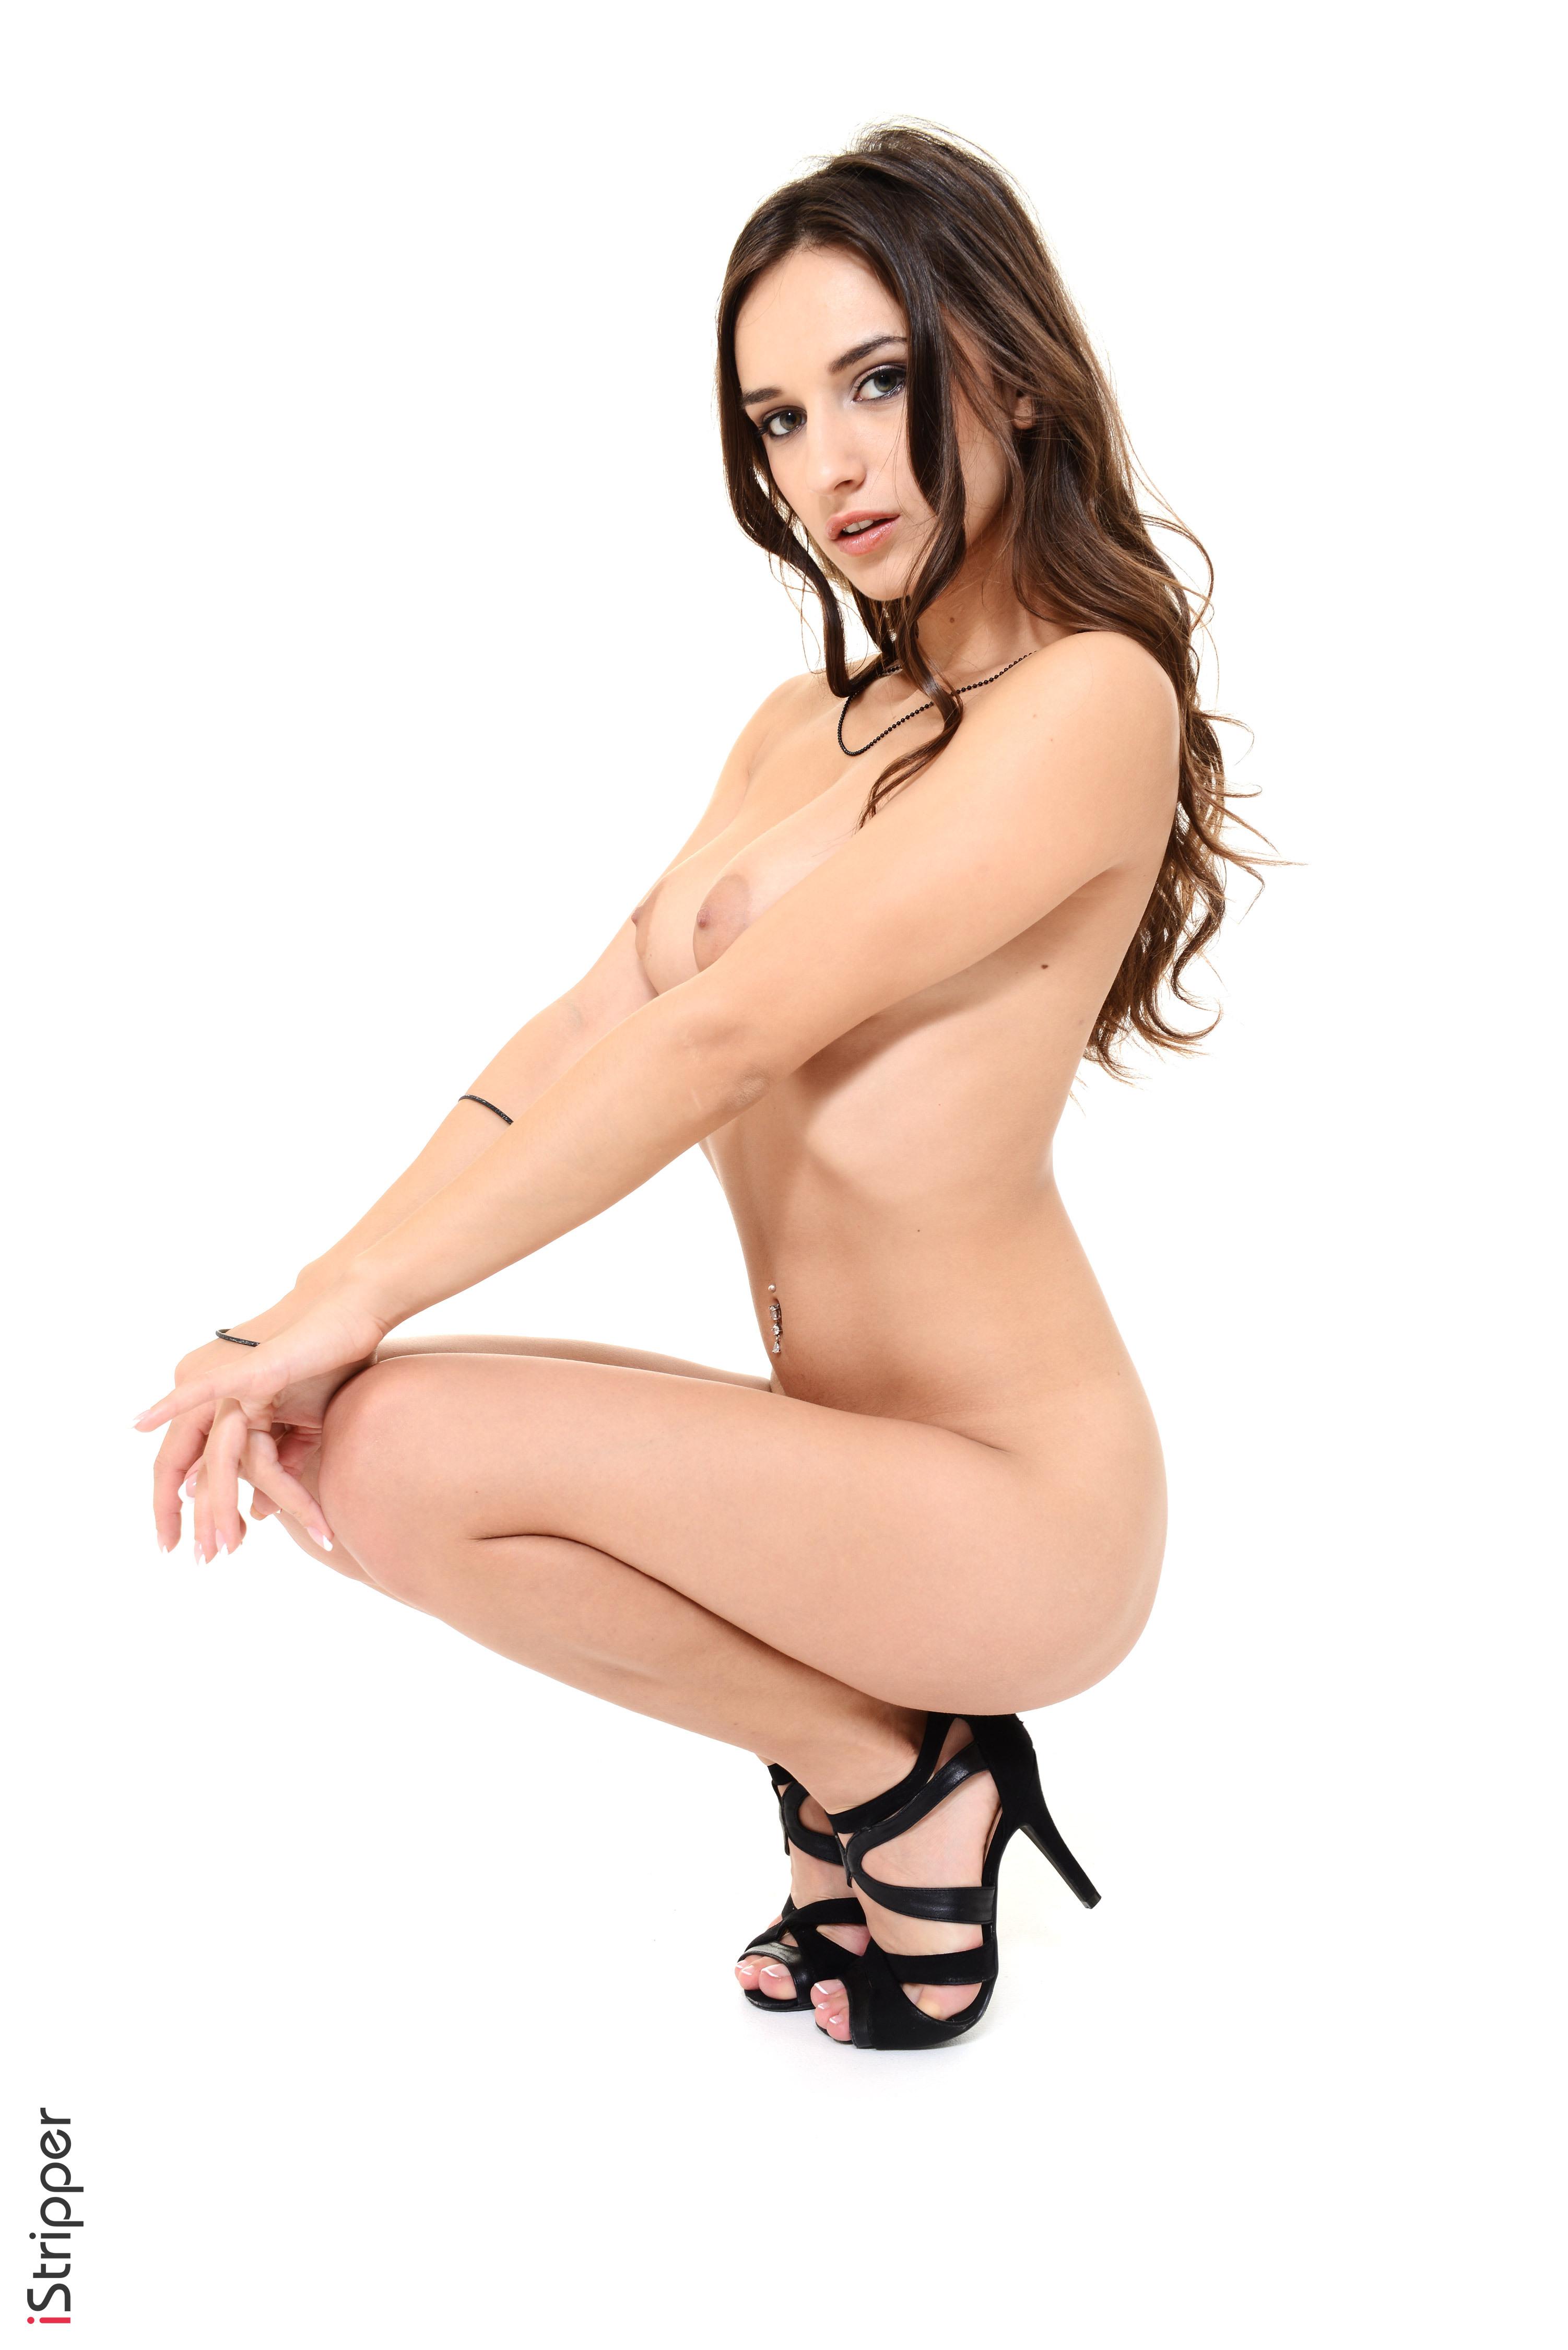 nude girl sexy wallpaper